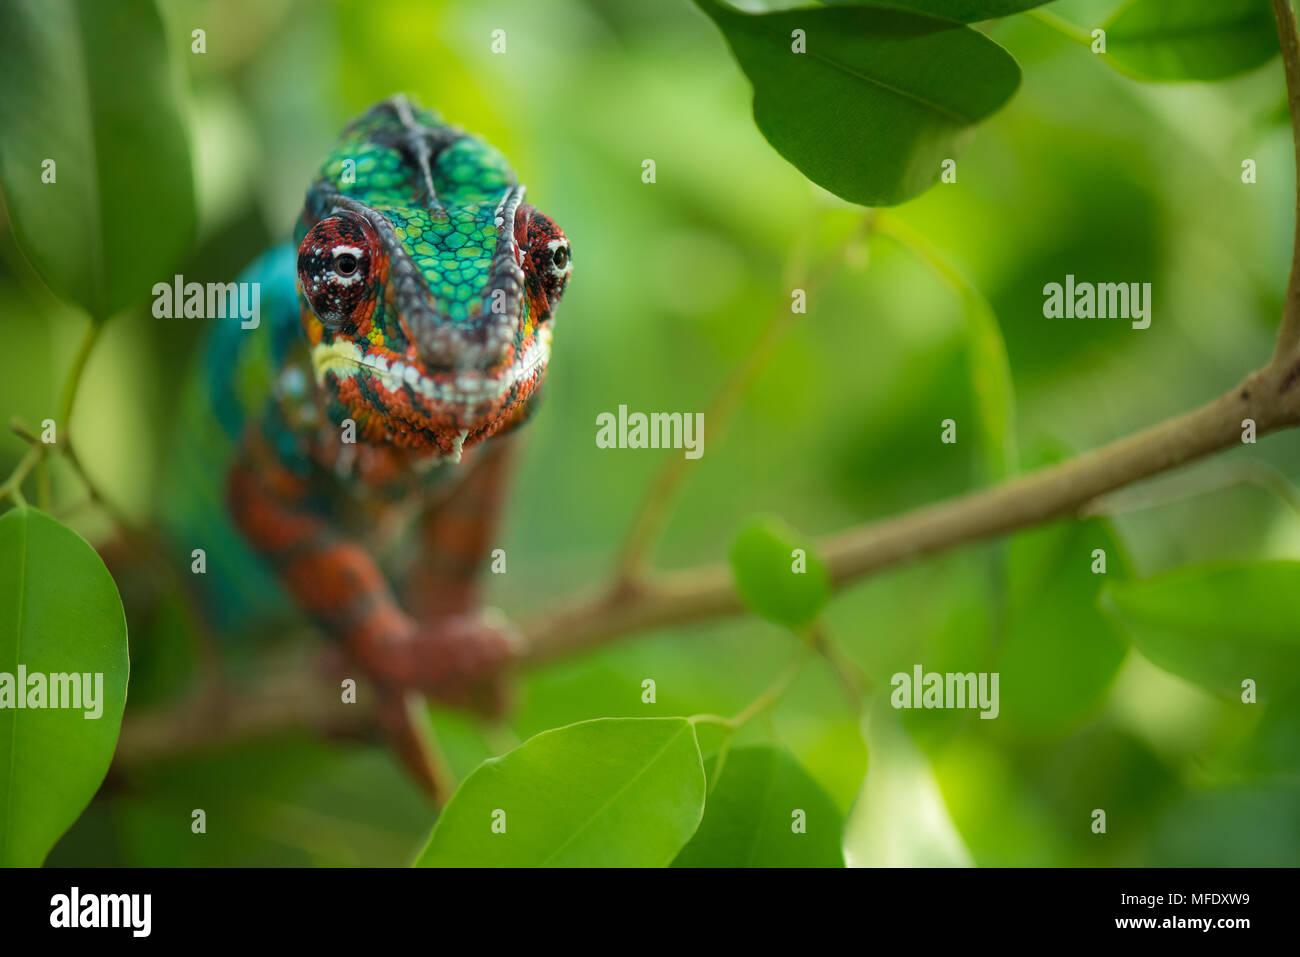 Panther chameleon con colori luminosi / Ambilobe / Madagascar wildlife / Furcifer pardalis / chameleon sul ramo Foto Stock